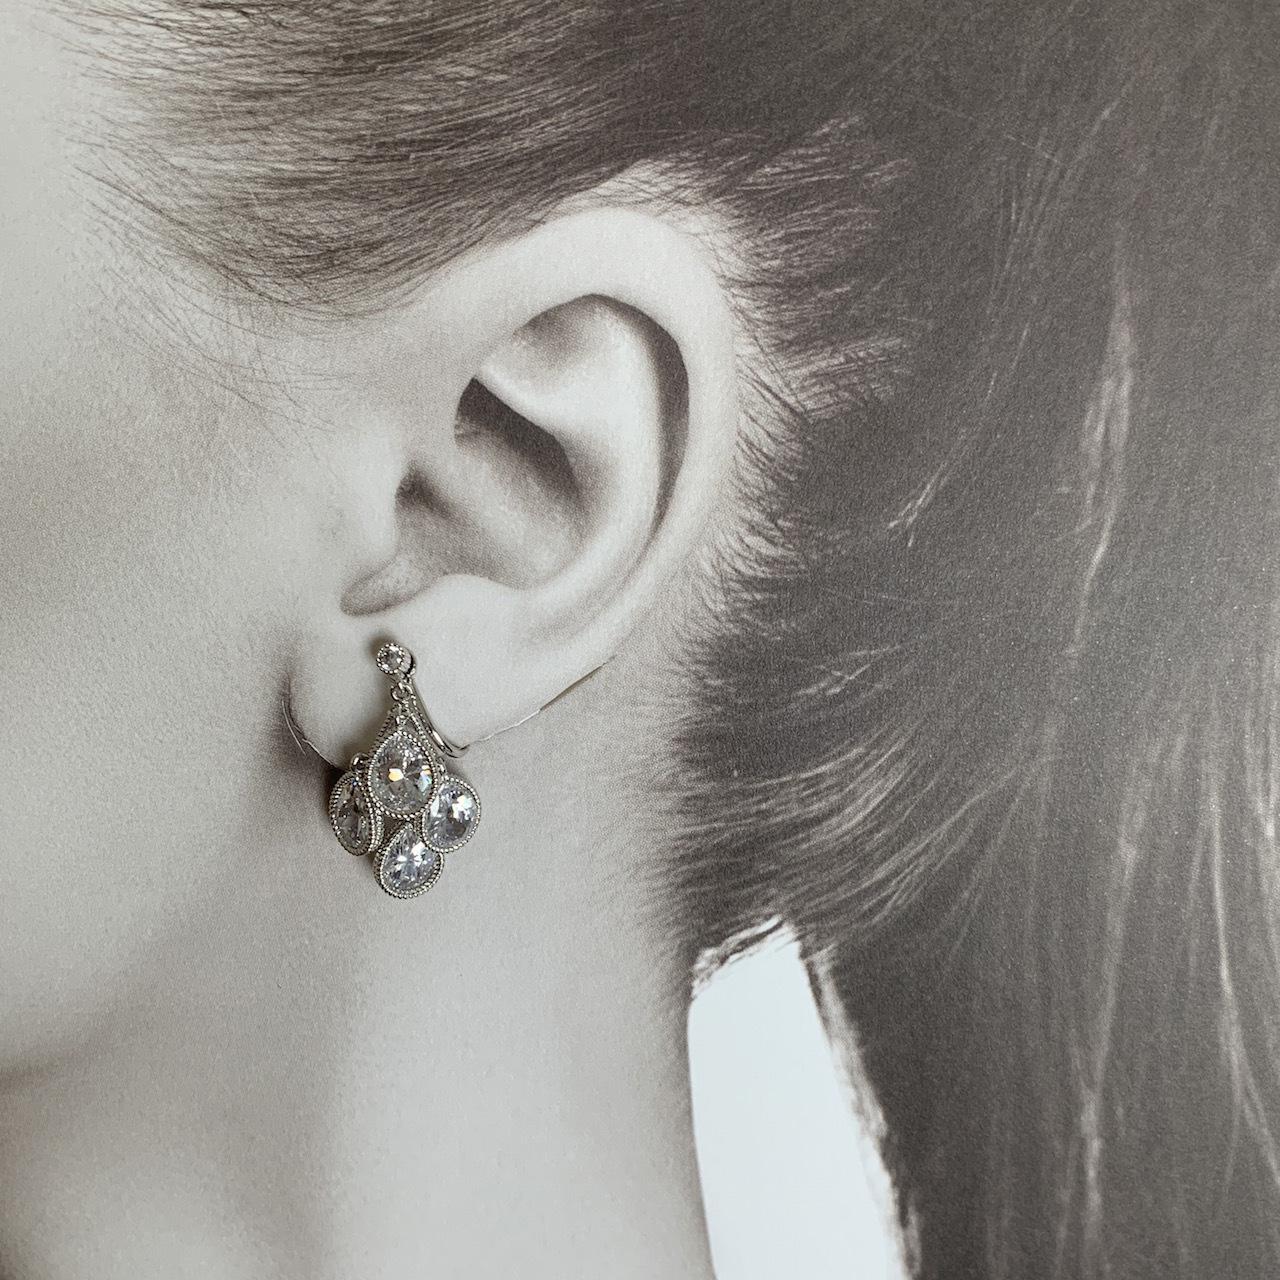 Teardrop earrings  ティアドロップイヤリング CZ  #SP0140 【STELLAPARK】